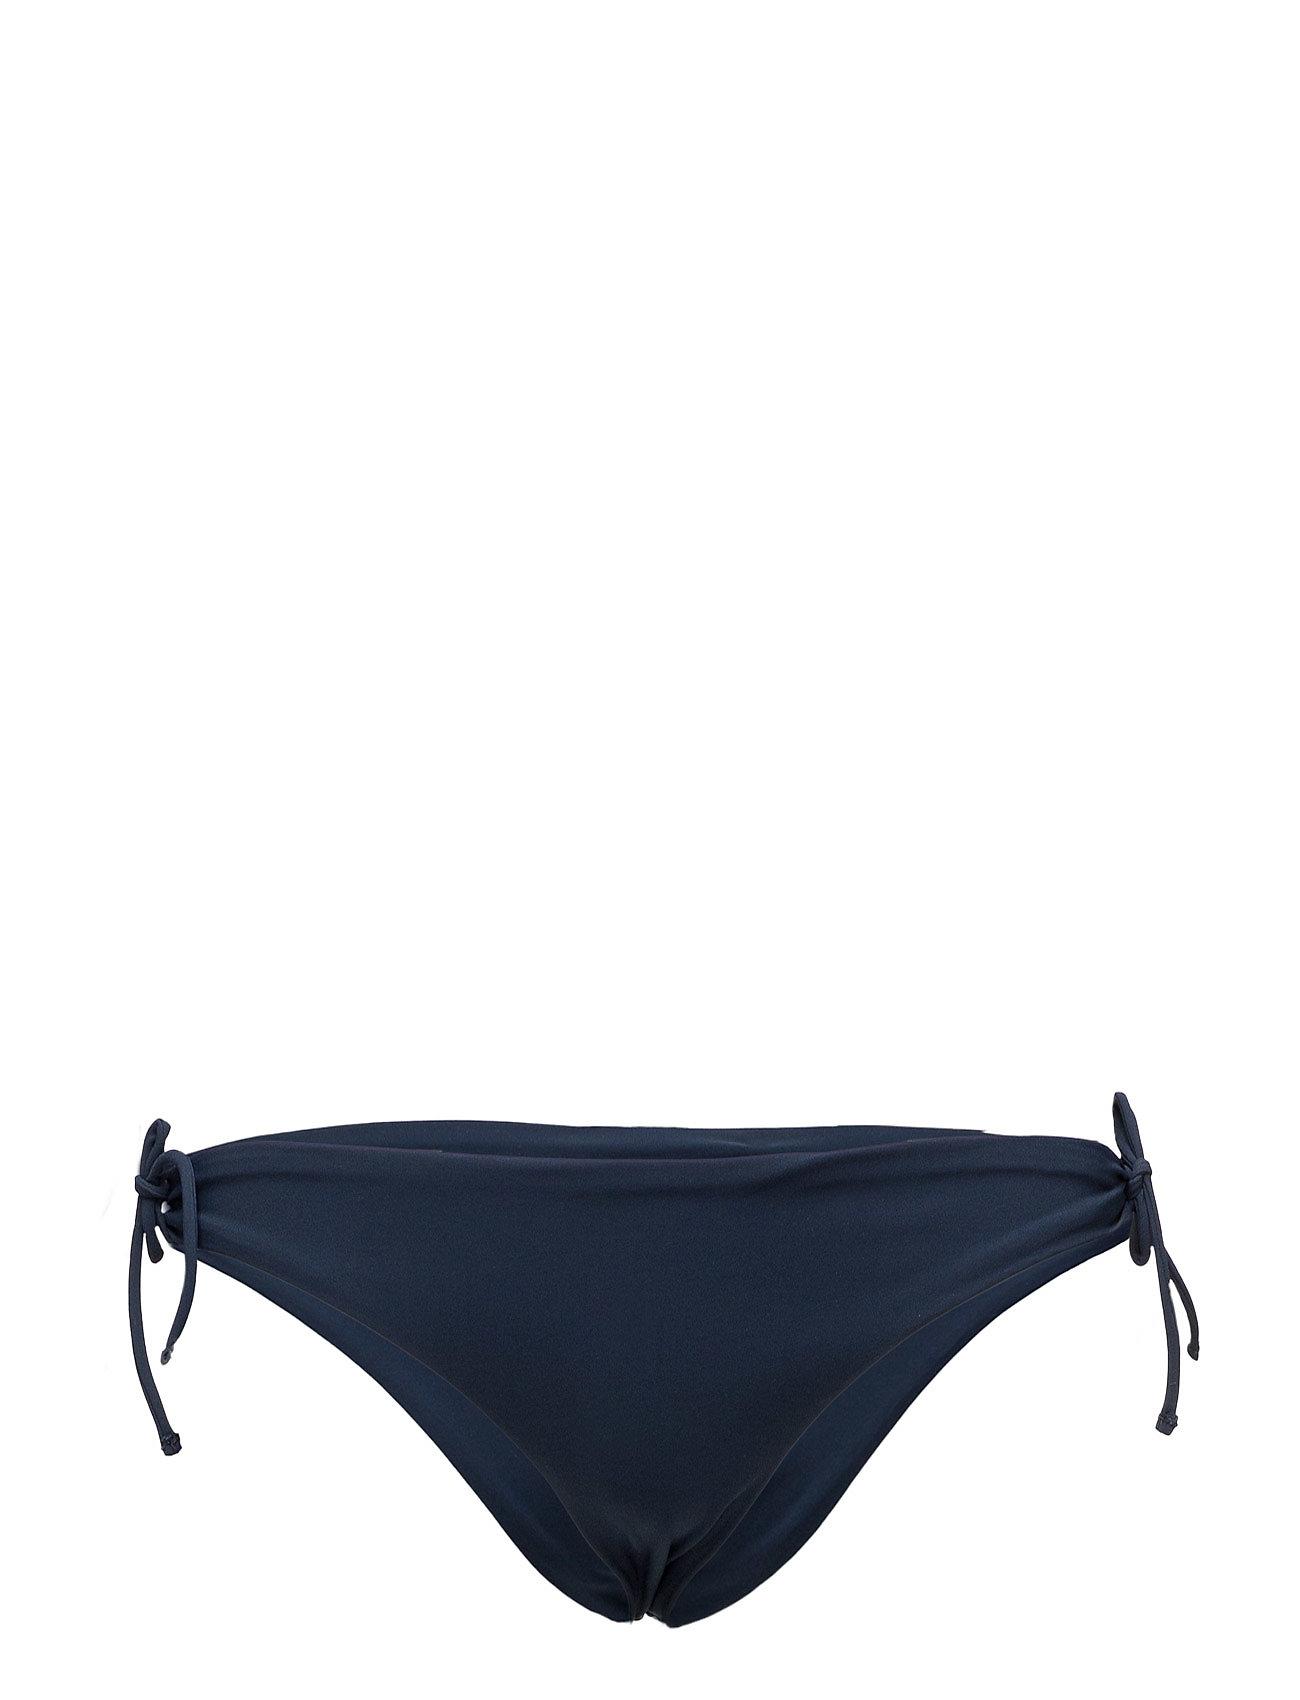 Mini Bikini Bottom Filippa K Bikinier til Damer i Sort